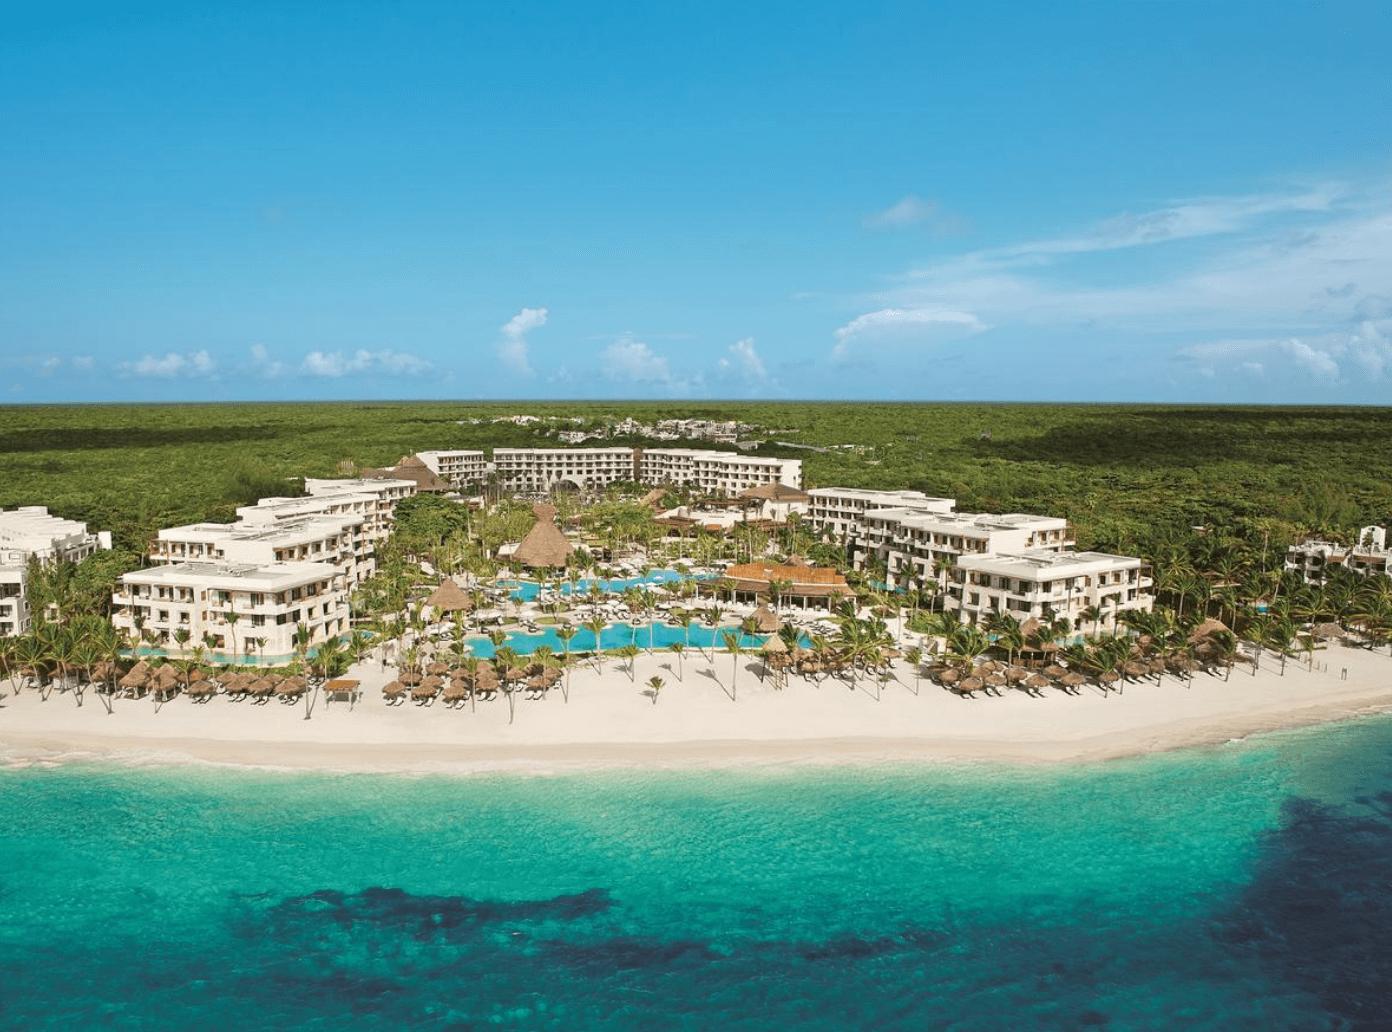 Secrets Akumal Wedding Hotels in the Riviera Maya